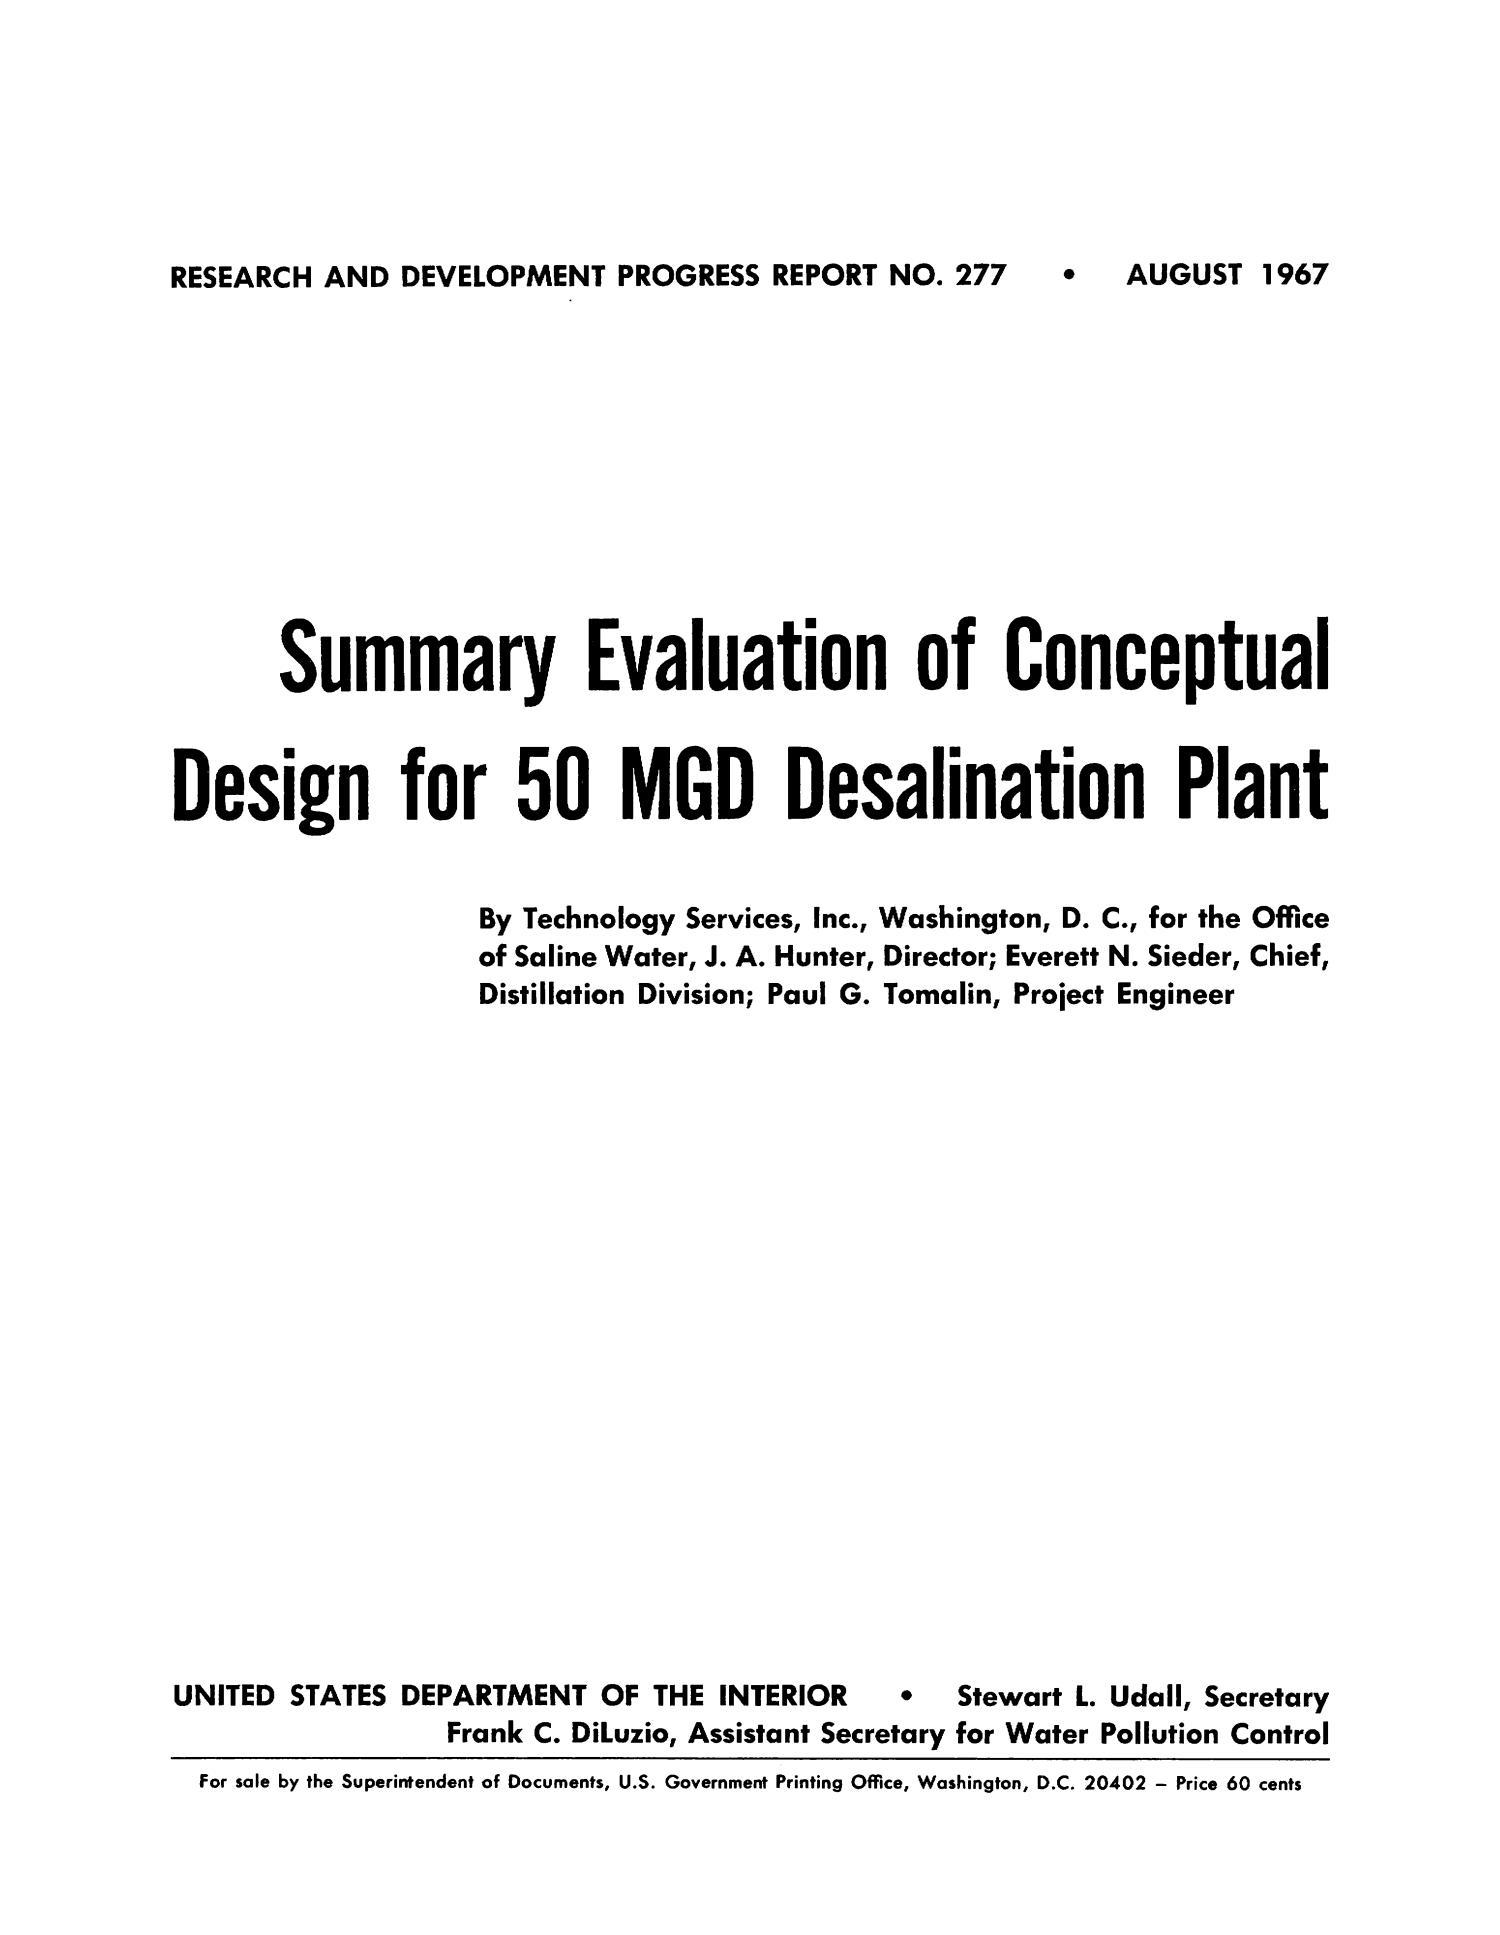 Summary Evaluation of Conceptual Design for 50 MGD Desalination